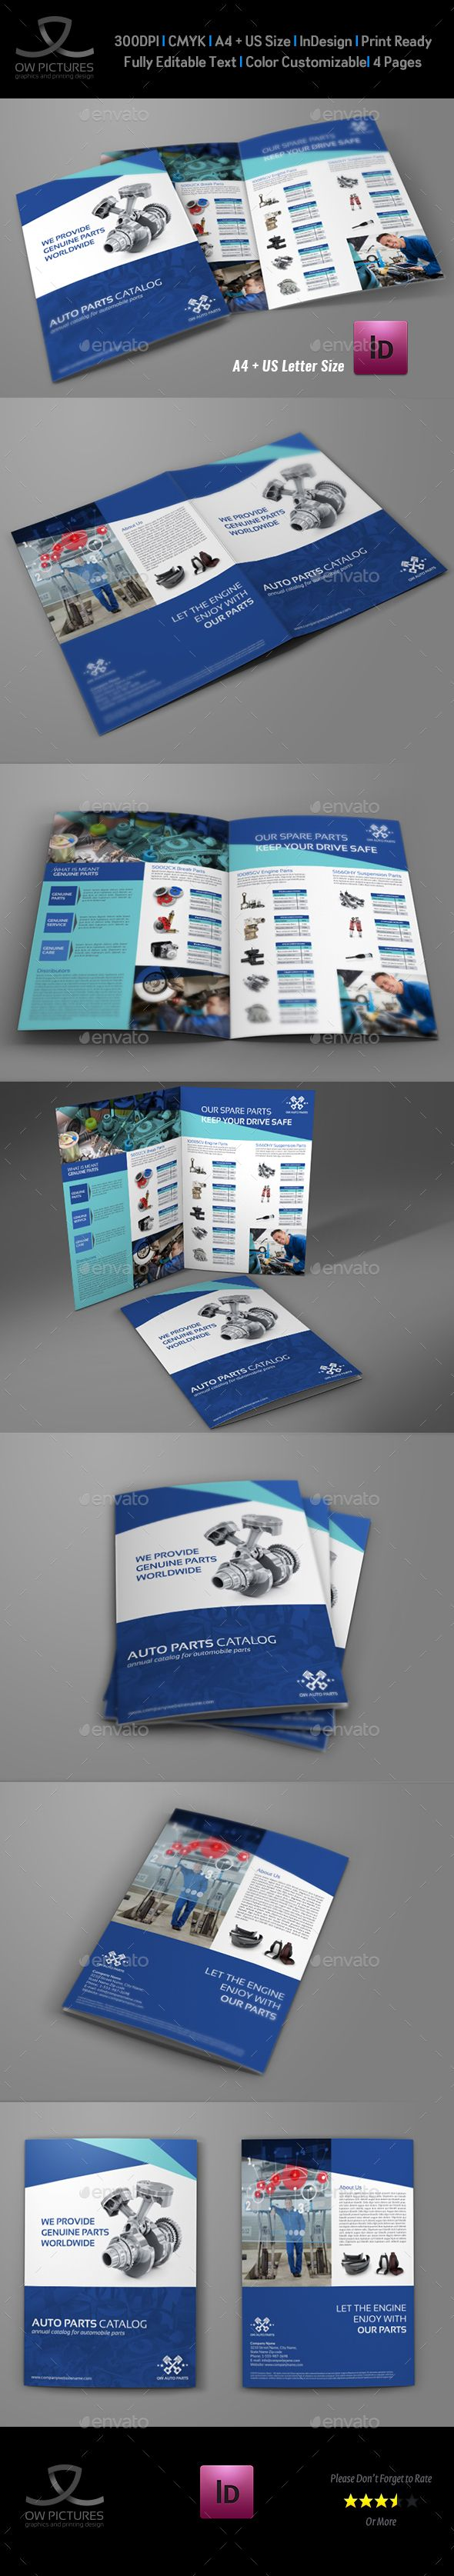 Auto Parts Catalog BiFold Brochure Template Brochure Template - Bi fold brochure template indesign